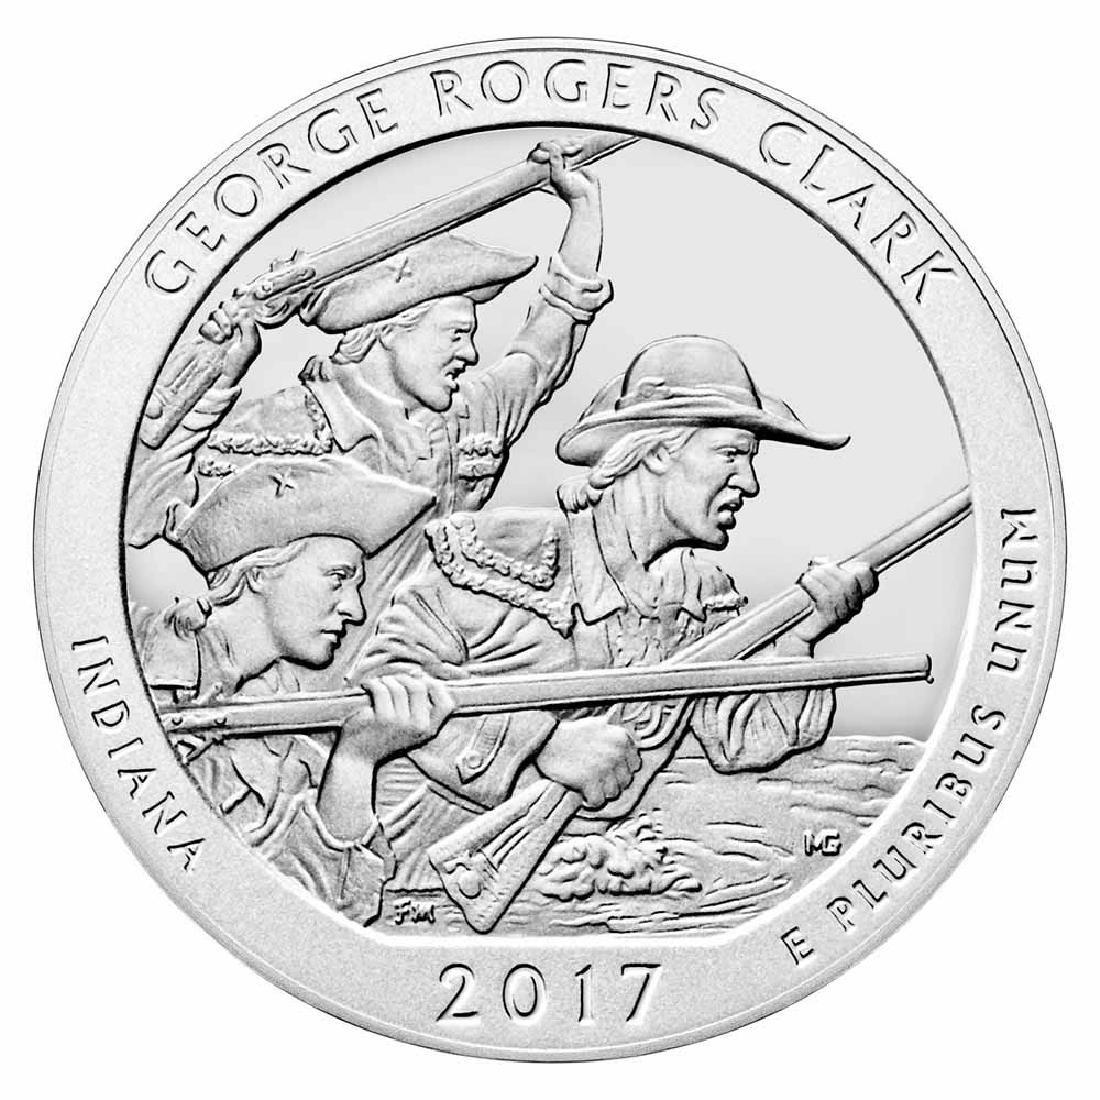 2017 Silver 5oz. George Rogers Clark ATB